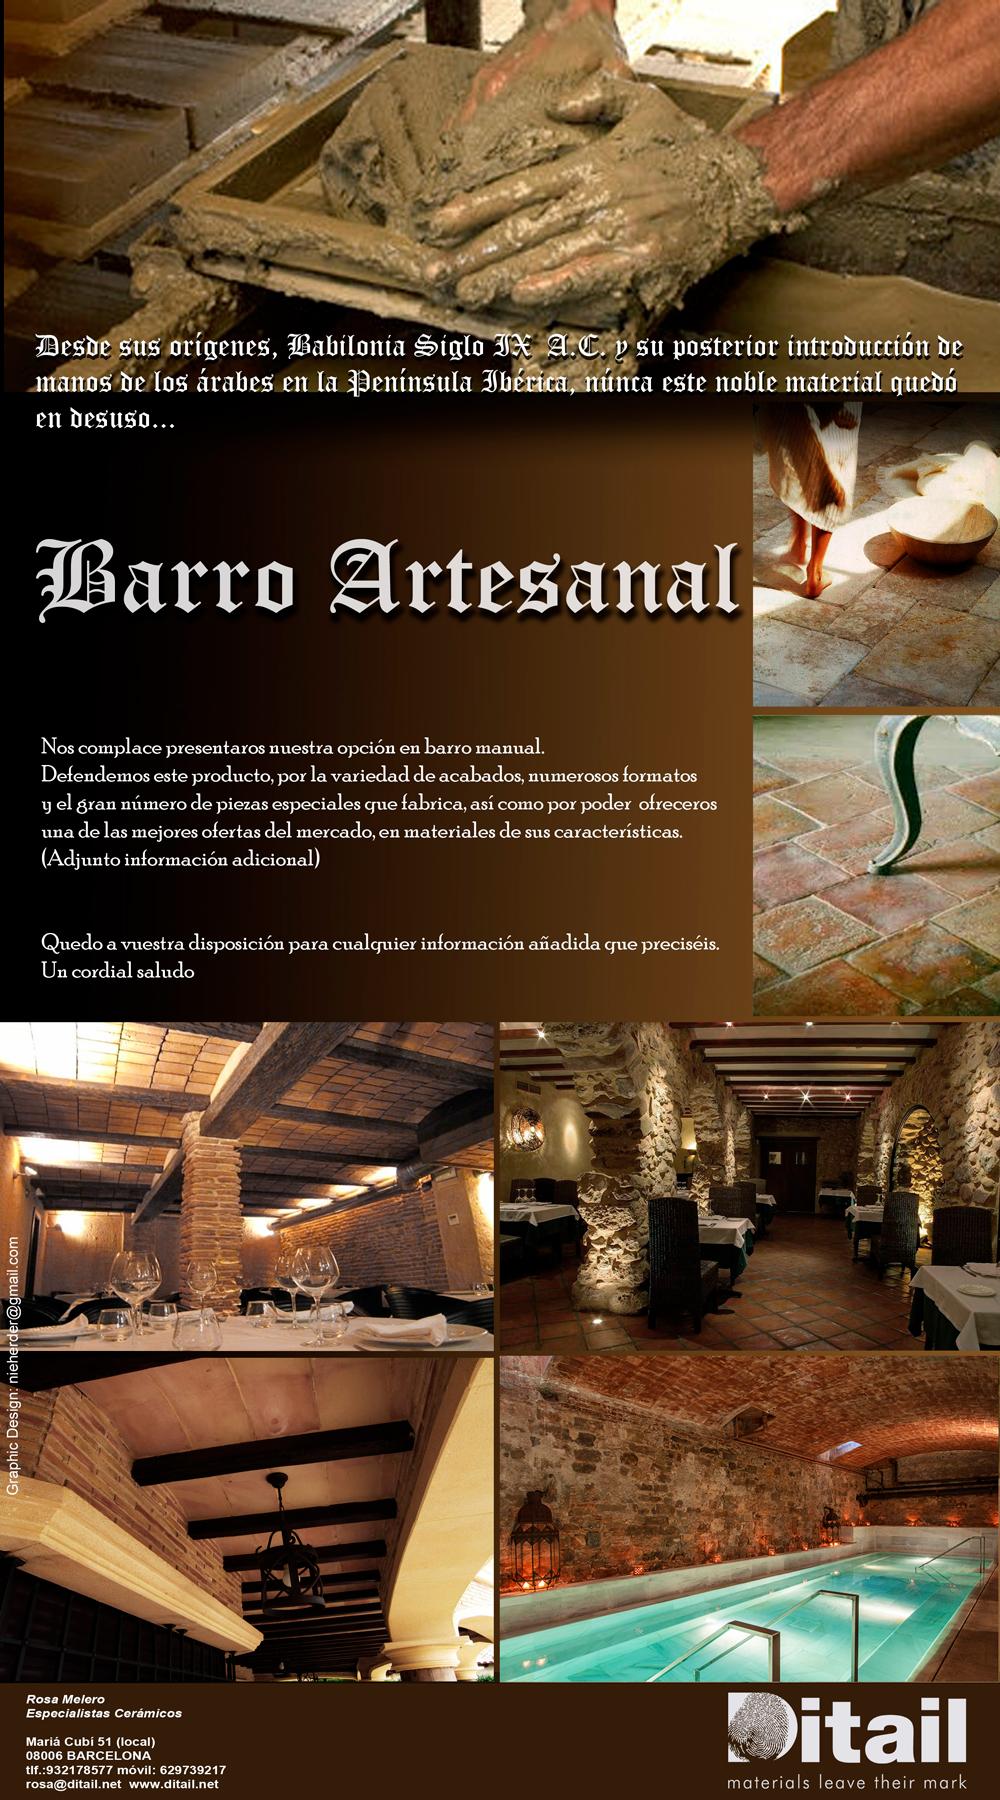 barro-artesanal